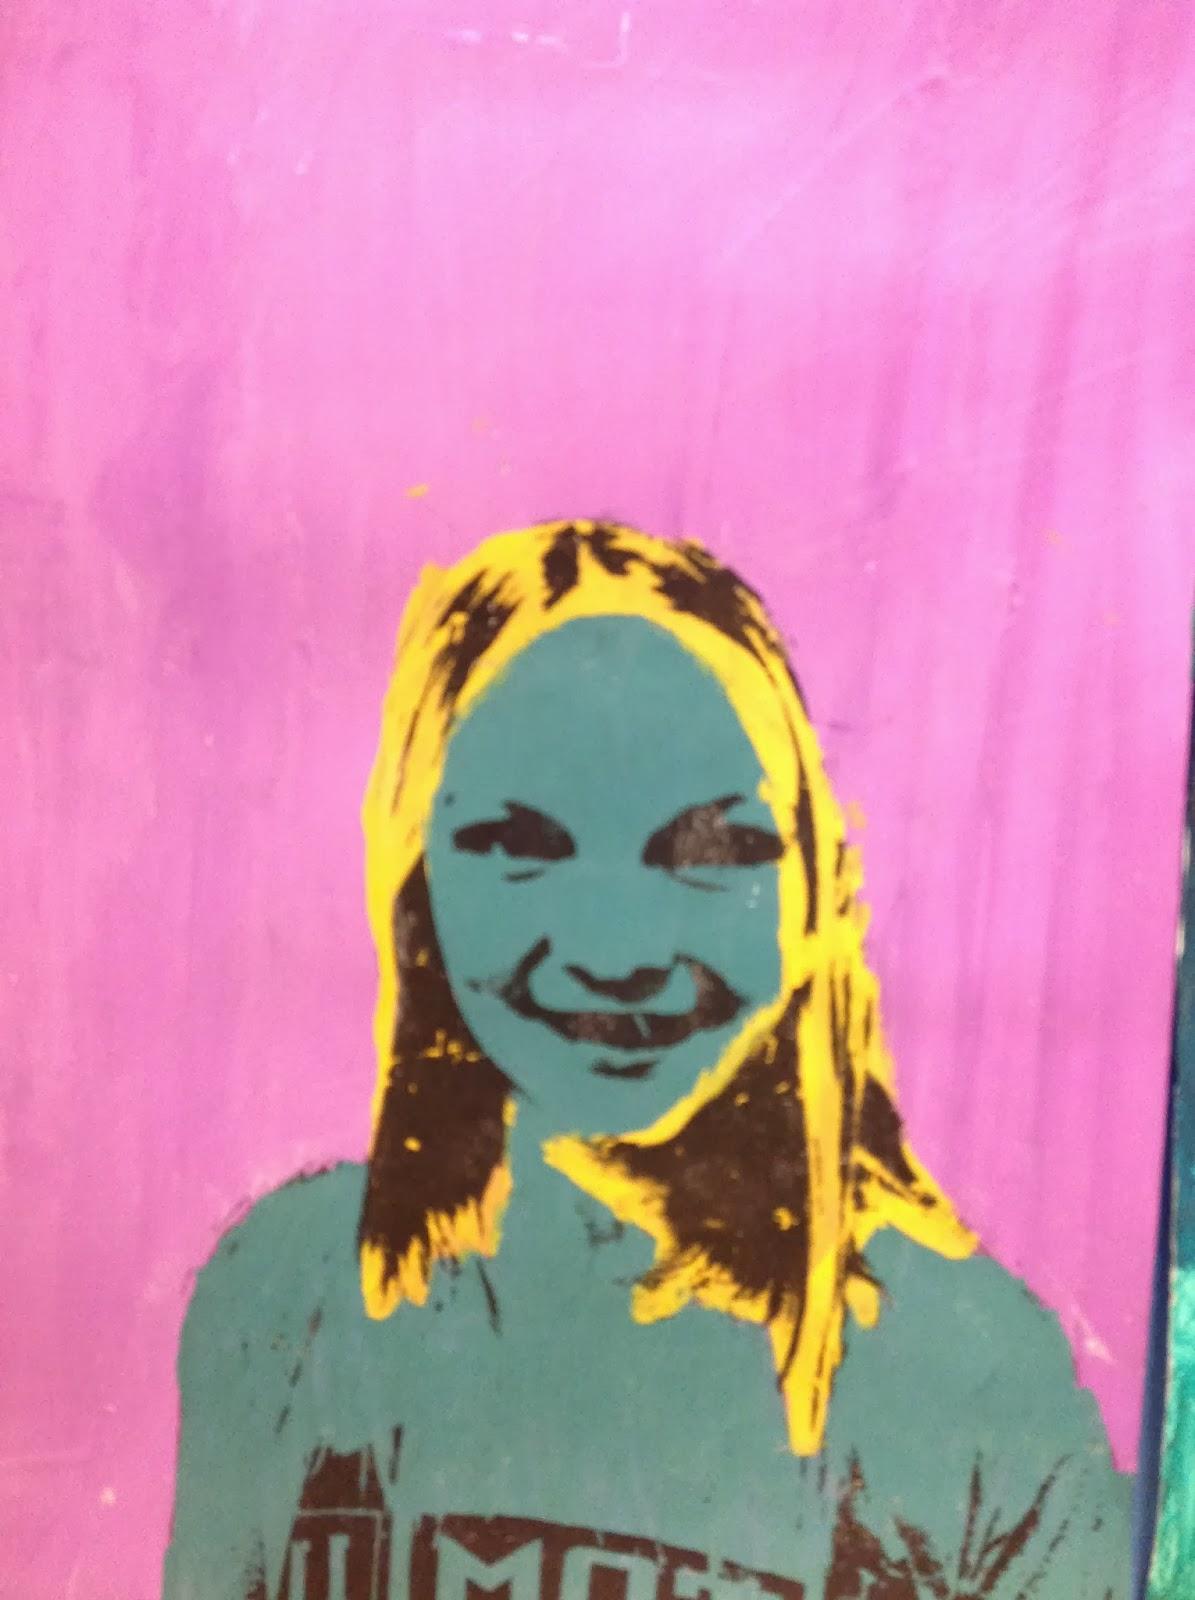 6th Grade Pop Art Portrait Inspired by Warhol